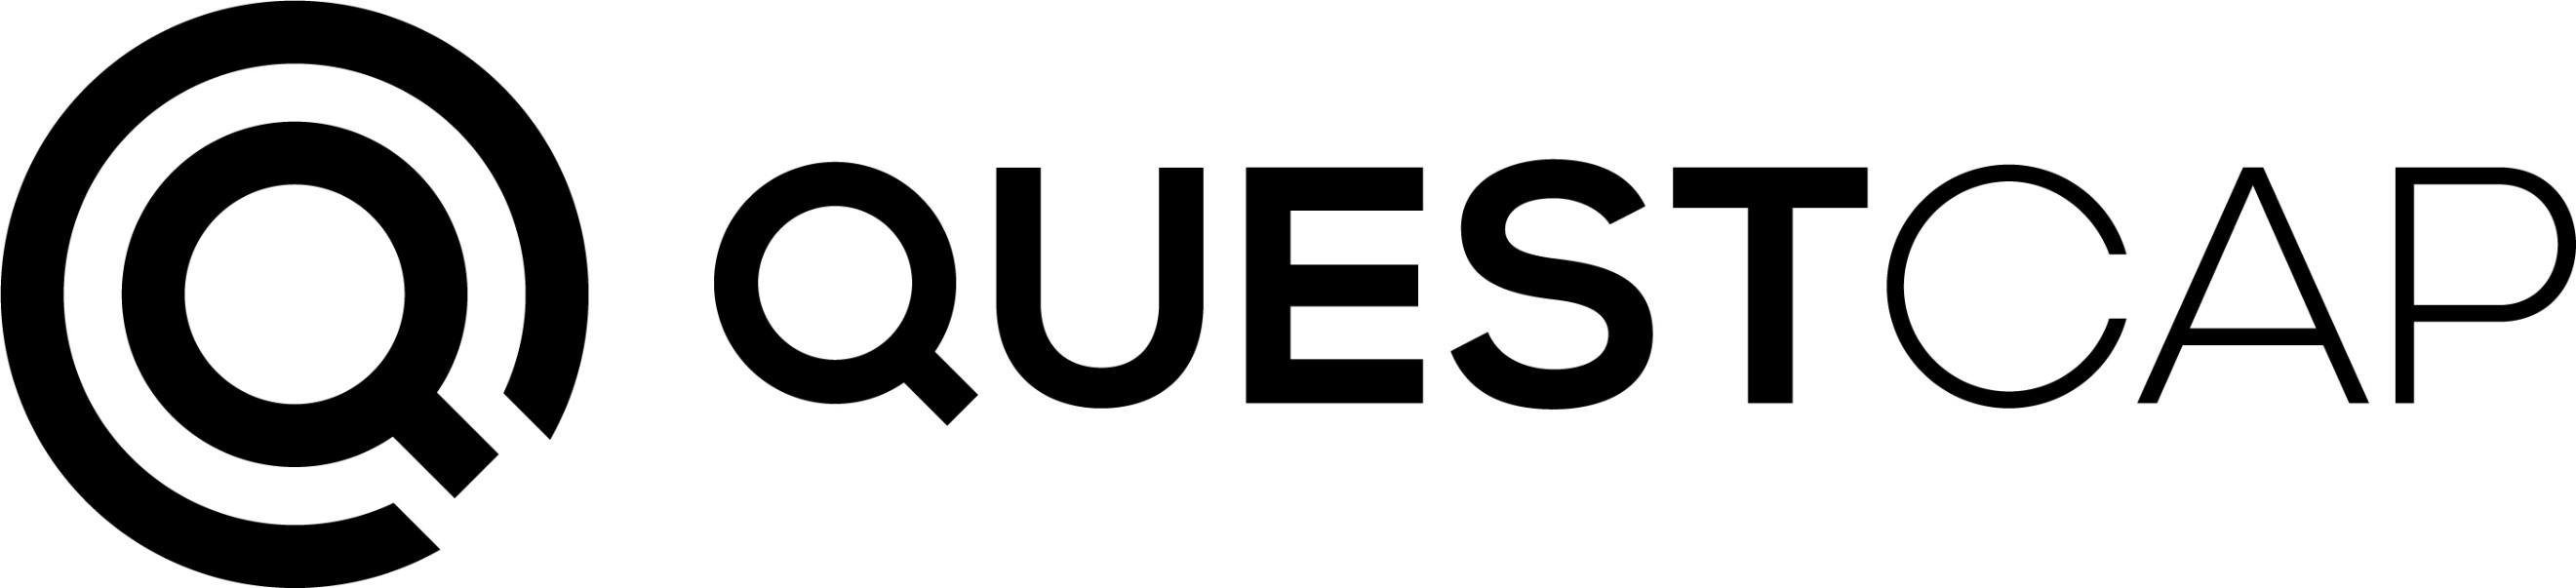 QuestCap Announces Upsizing of Private Placement Financing